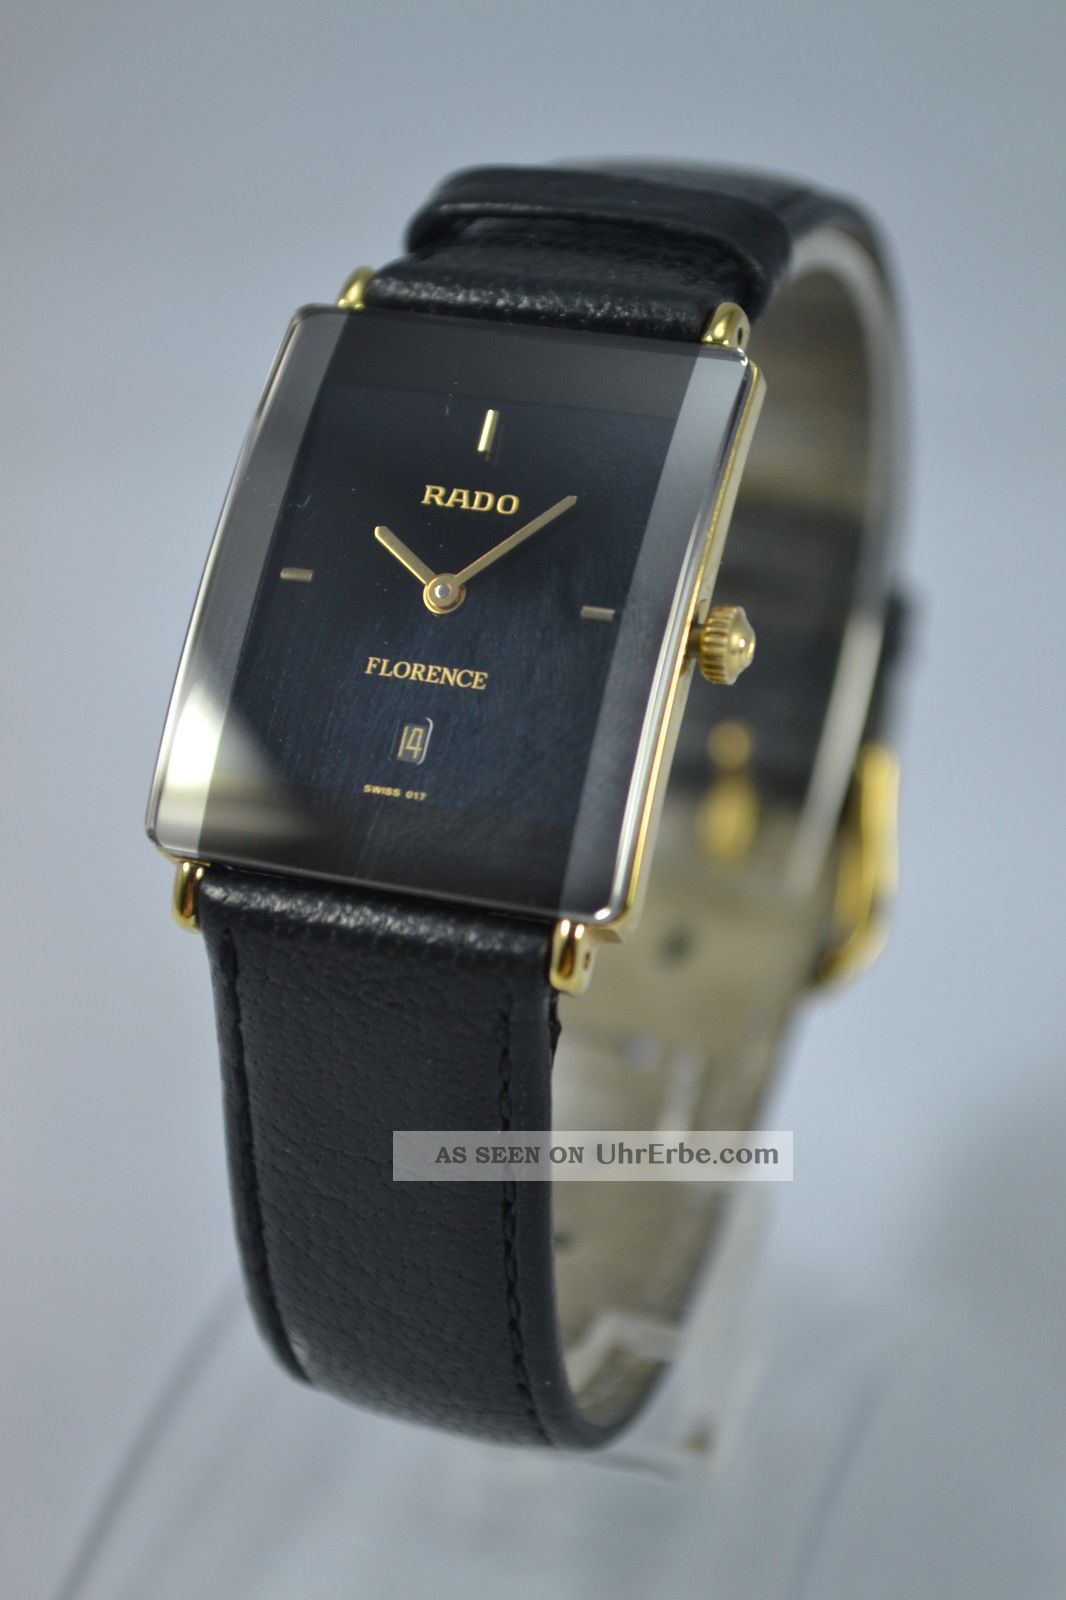 Rado Florence Damenuhr Swiss Schweizeruhr 160.  3605.  2n Armbanduhren Bild